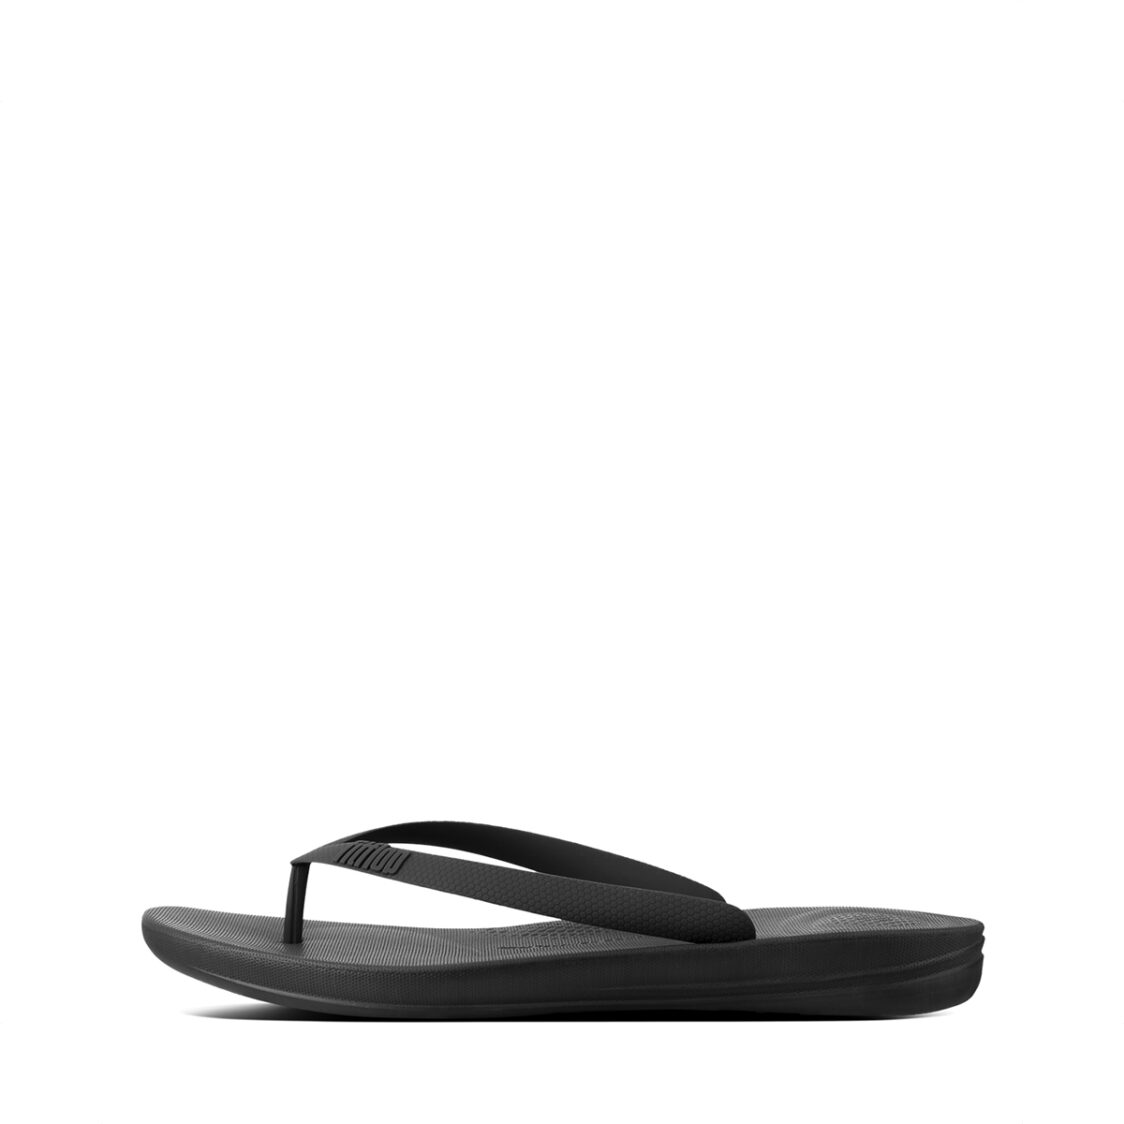 Fitflop Iqushion Ergonomic Flip-flops Black J80-001